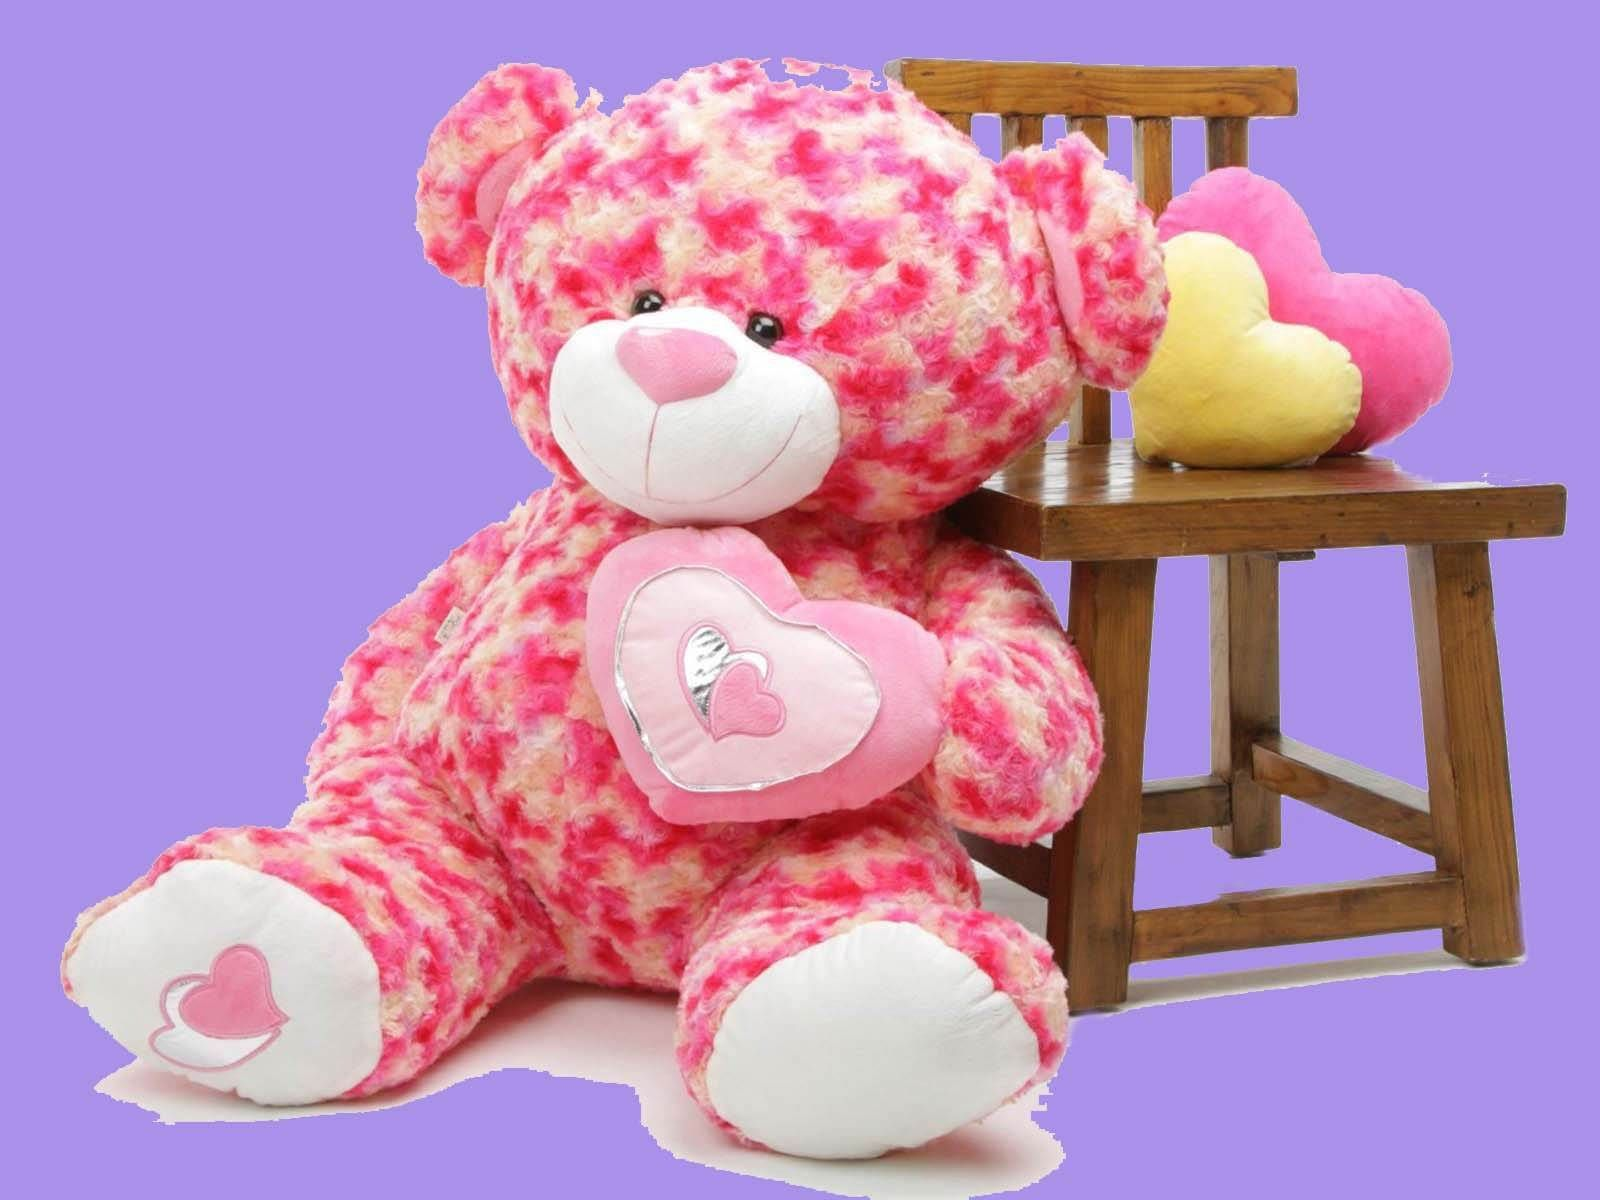 Top Wallpaper Mobile Teddy Bear - ff0a00b997ed85cfd360edcb57c57b68  Collection_45661.jpg